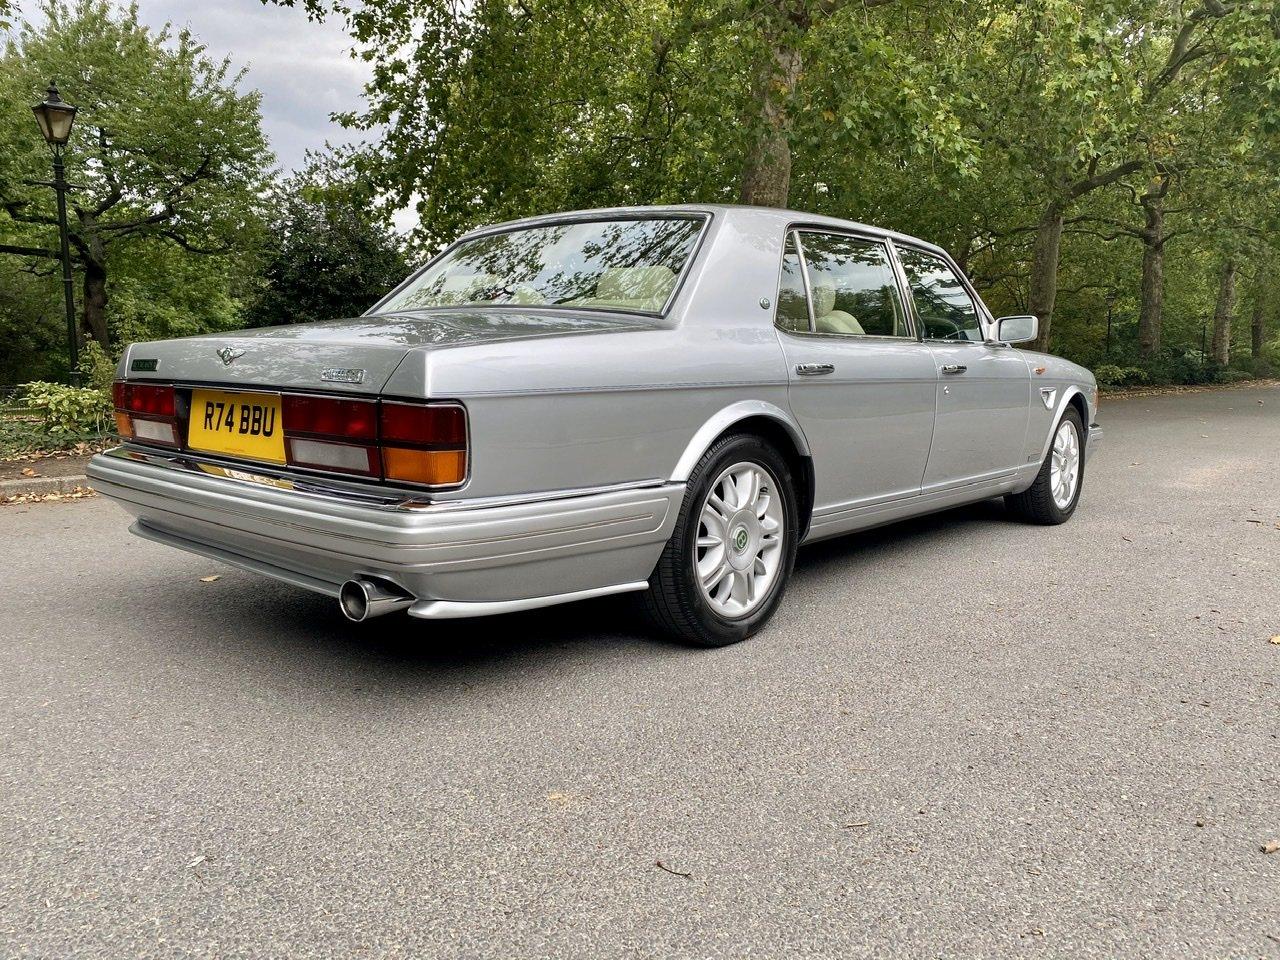 1998 Bentley Brooklands 'R' Mulliner For Sale (picture 7 of 22)